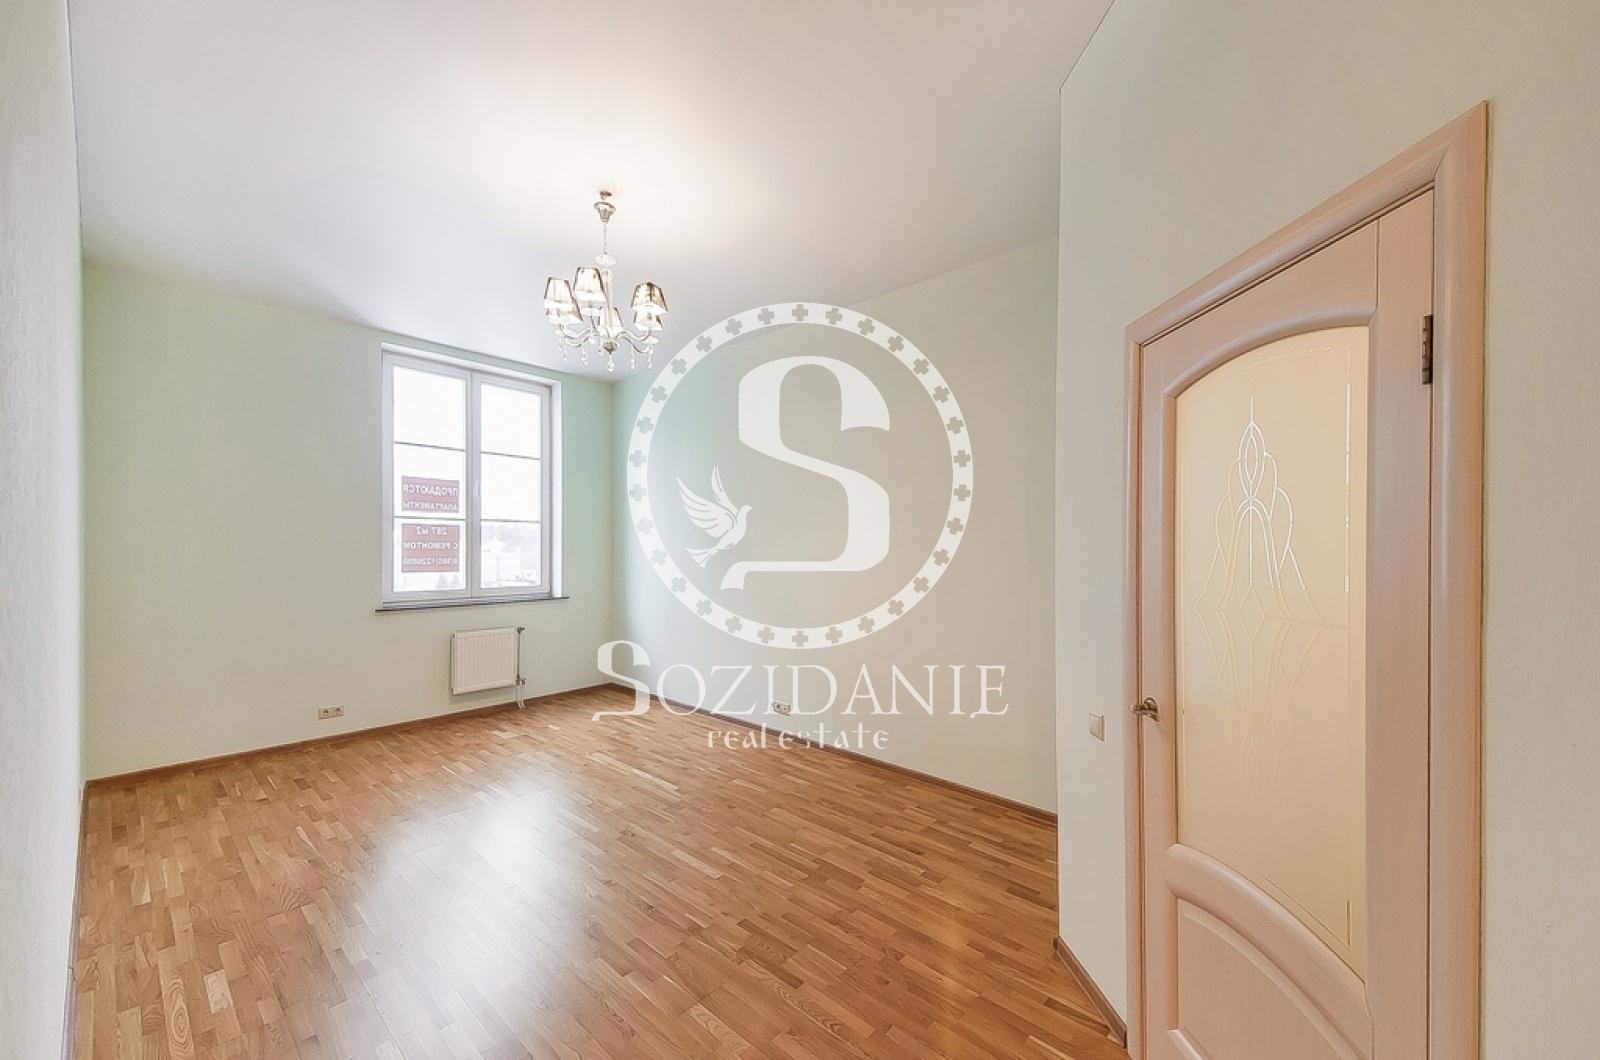 5 Комнаты, Городская, Продажа, Улица Береговая, Listing ID 1293, Москва, Россия,